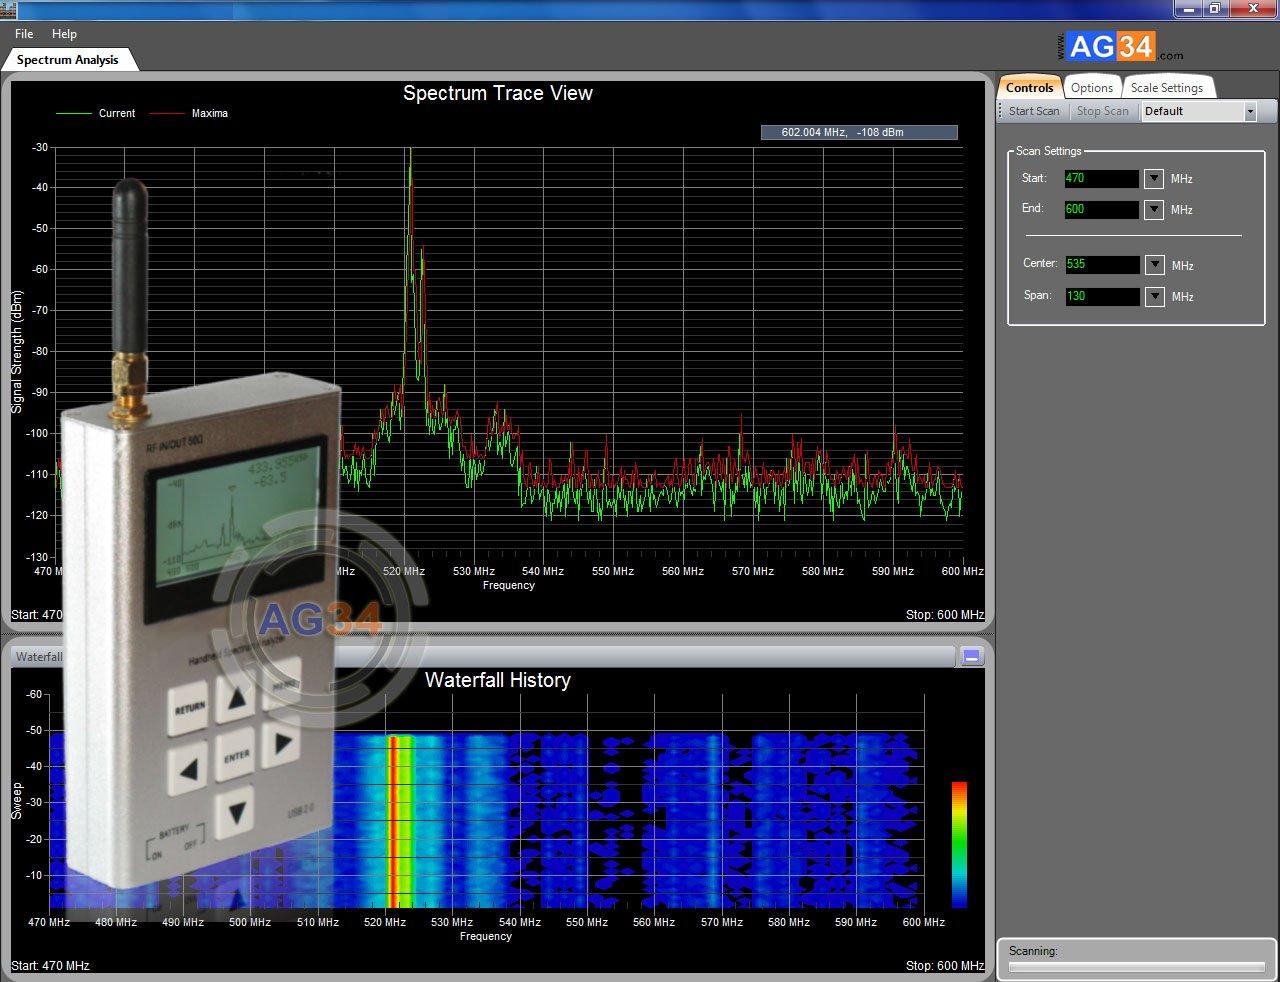 SA-1 Böcek Arama Spektrum Analizörü